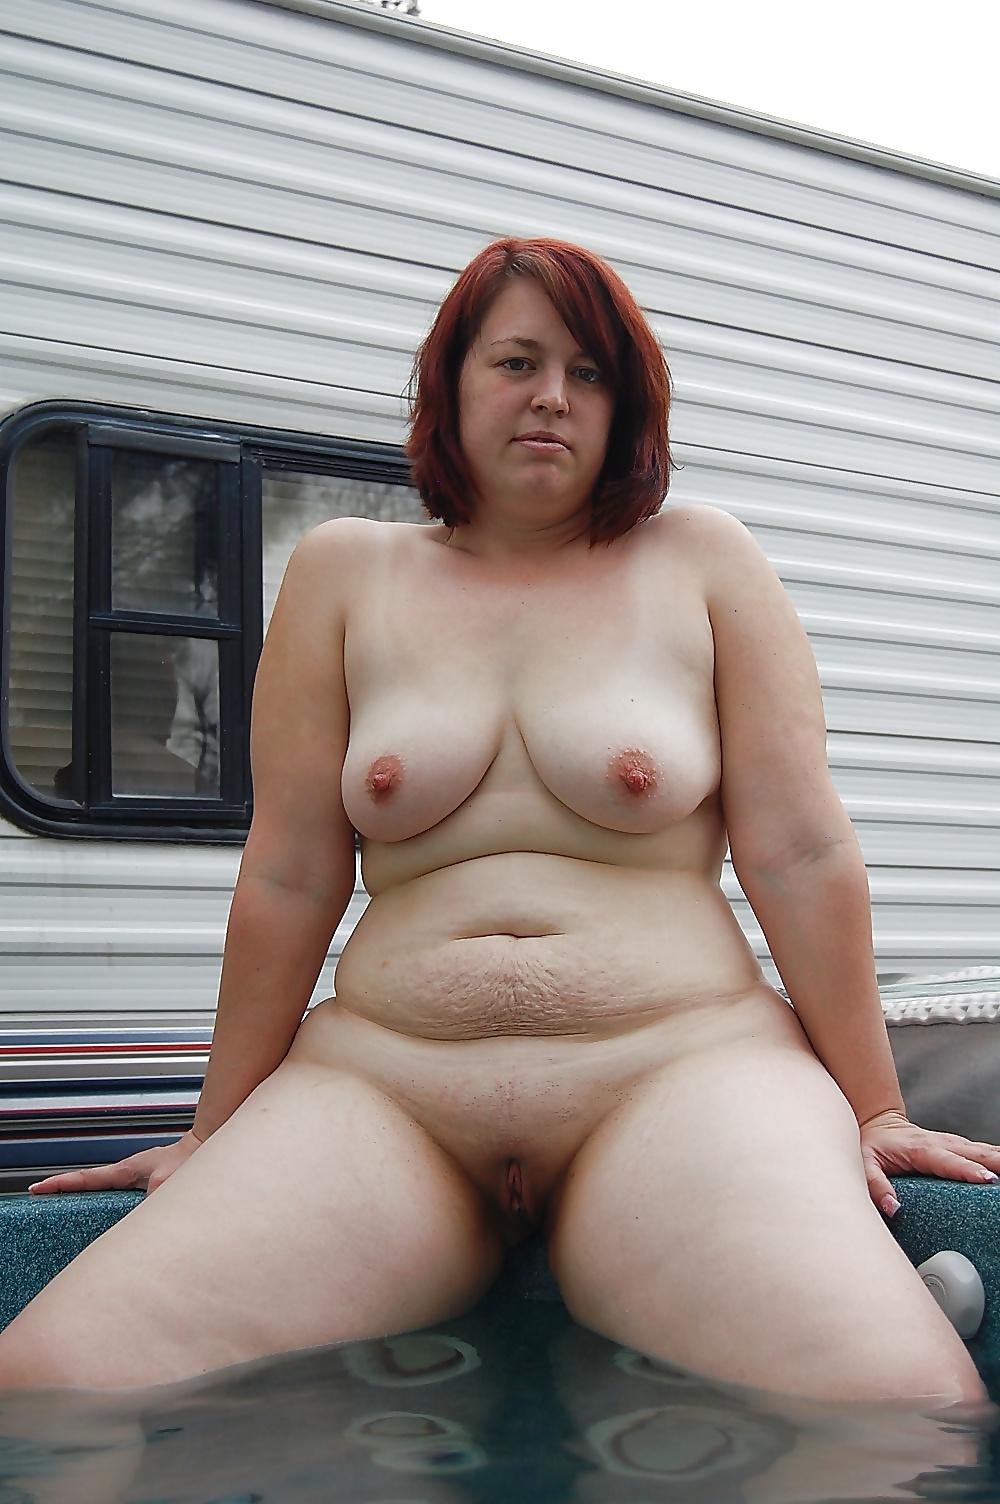 Swinger hot tub party naked